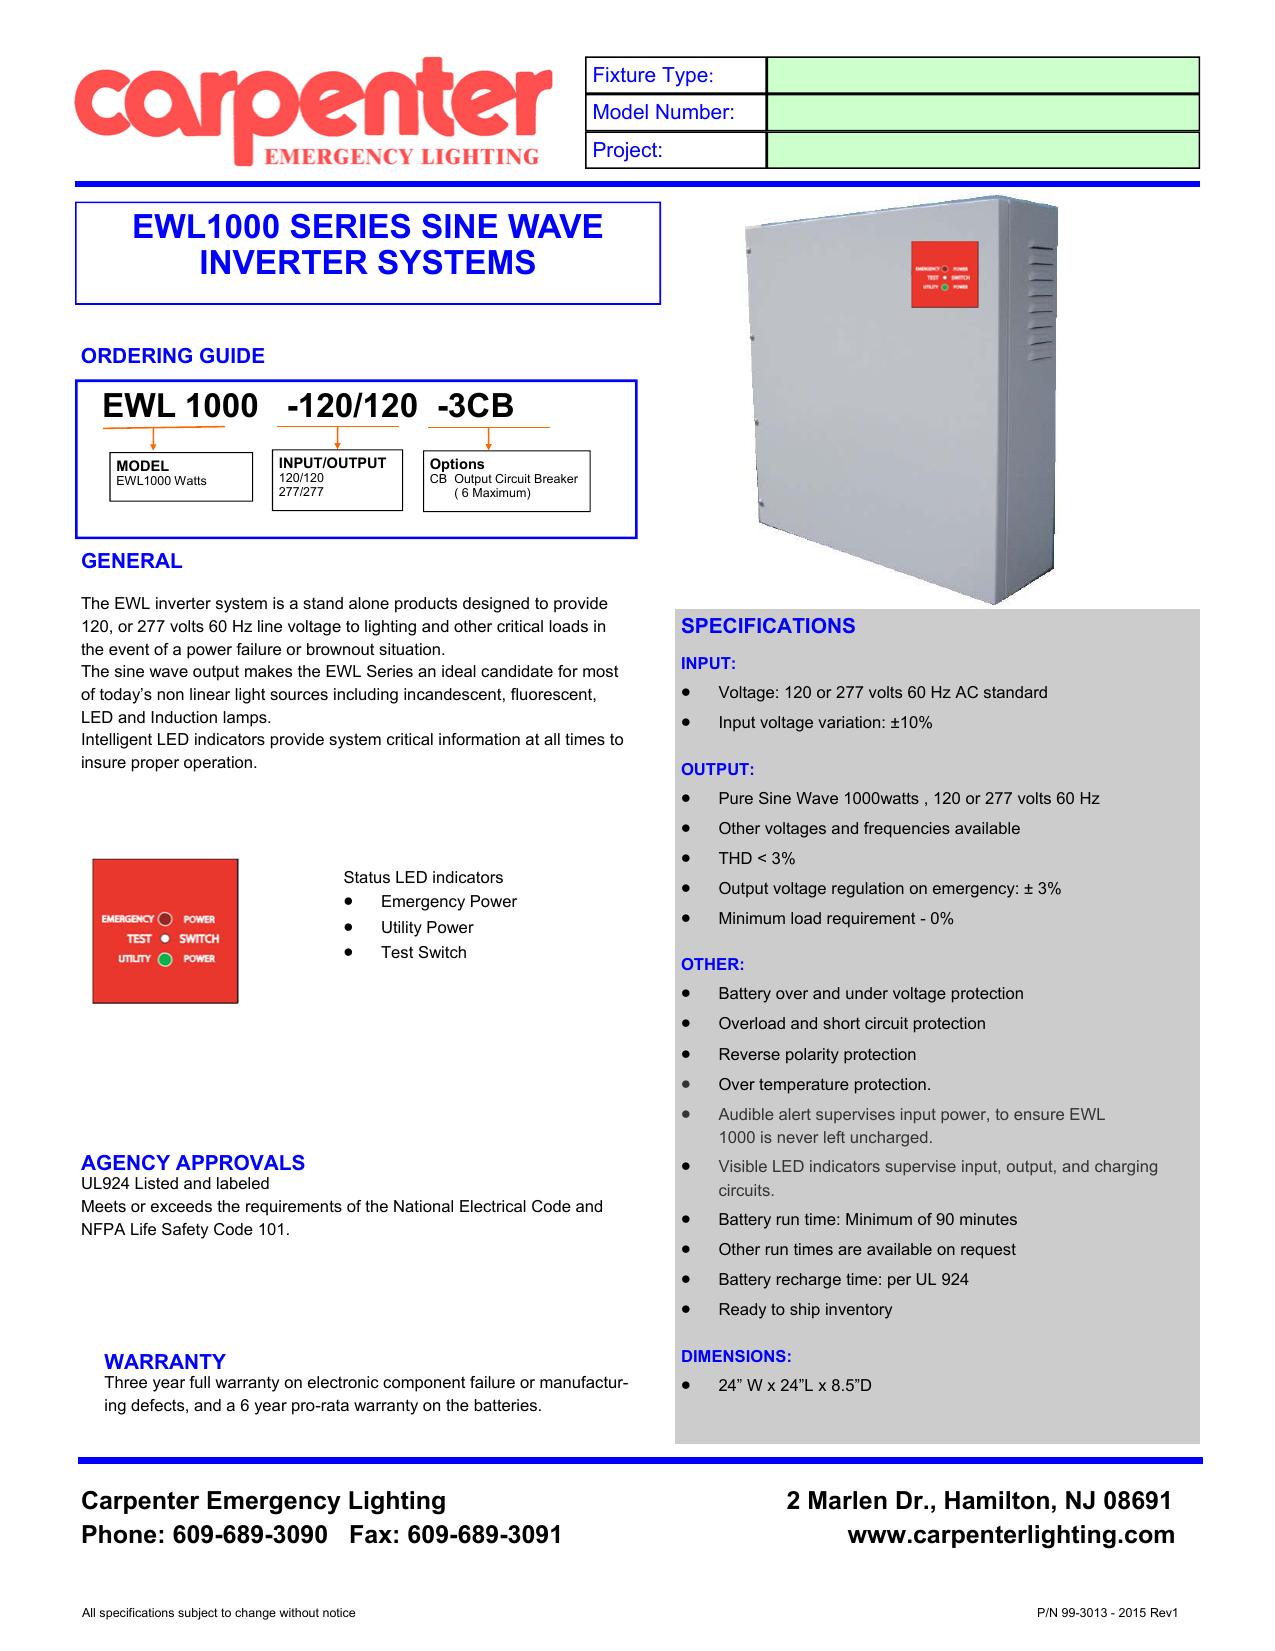 Ewl1000 Inverter Pub Carpenter